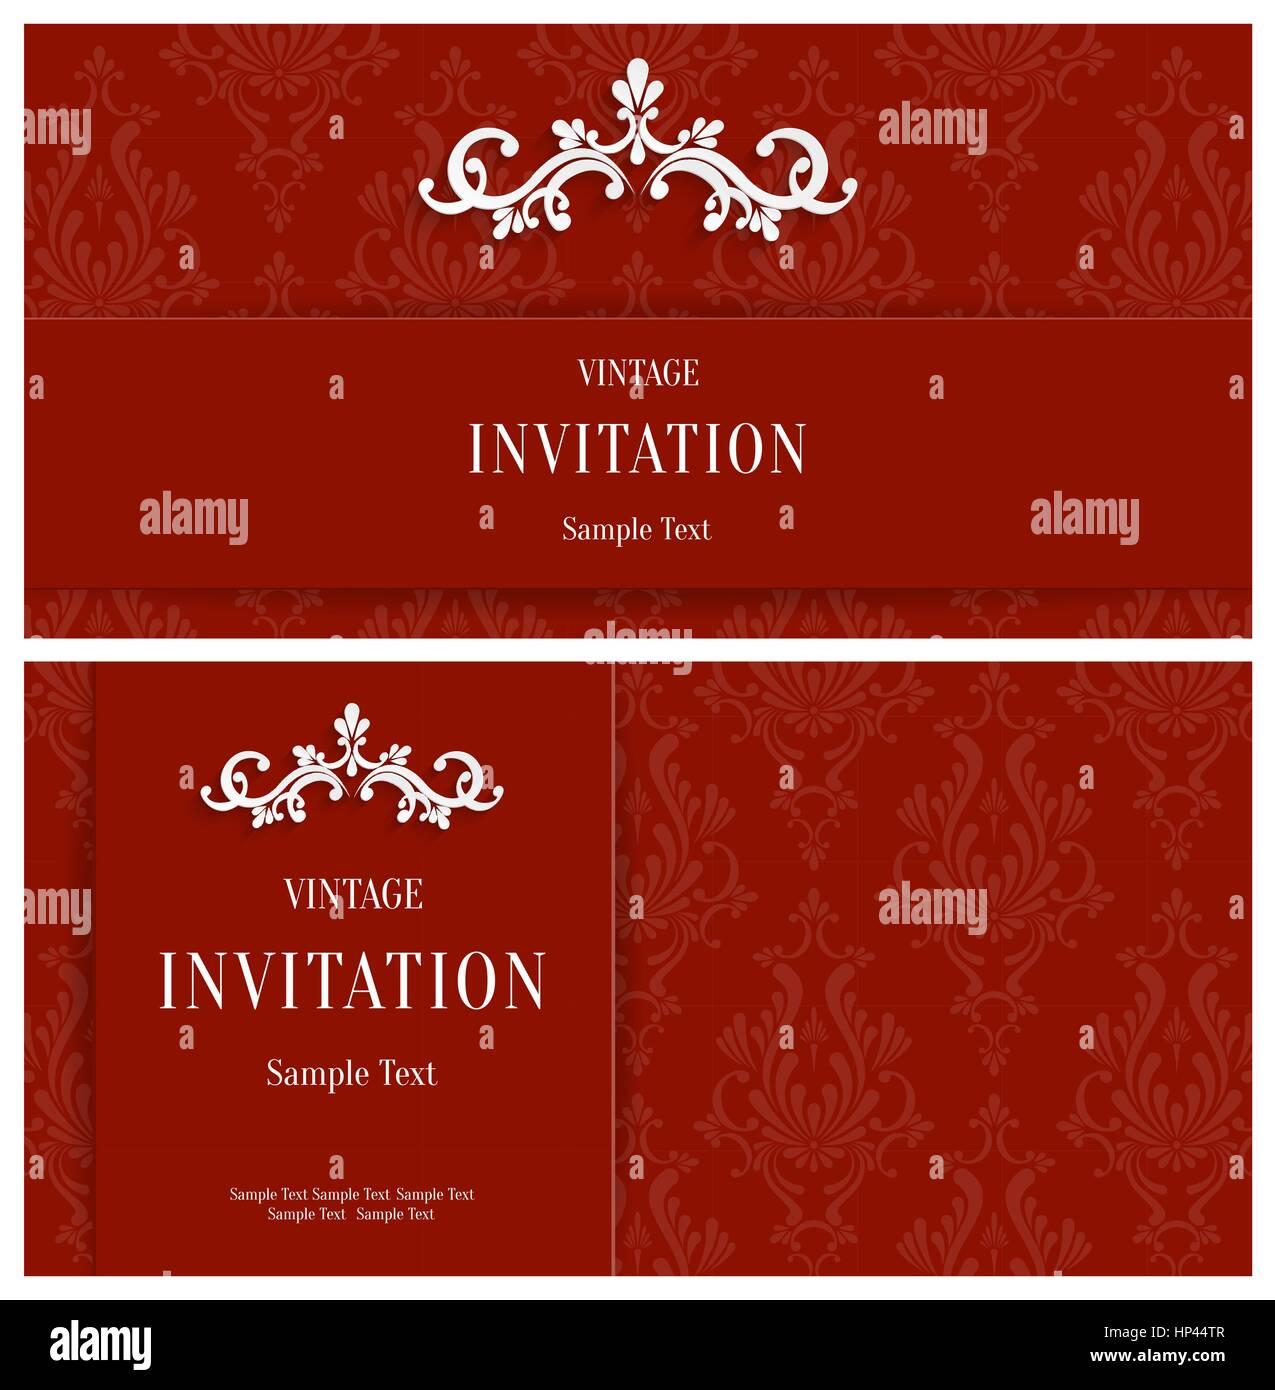 Winter Wedding Invitation Vector Vectors Stock Photos & Winter ...